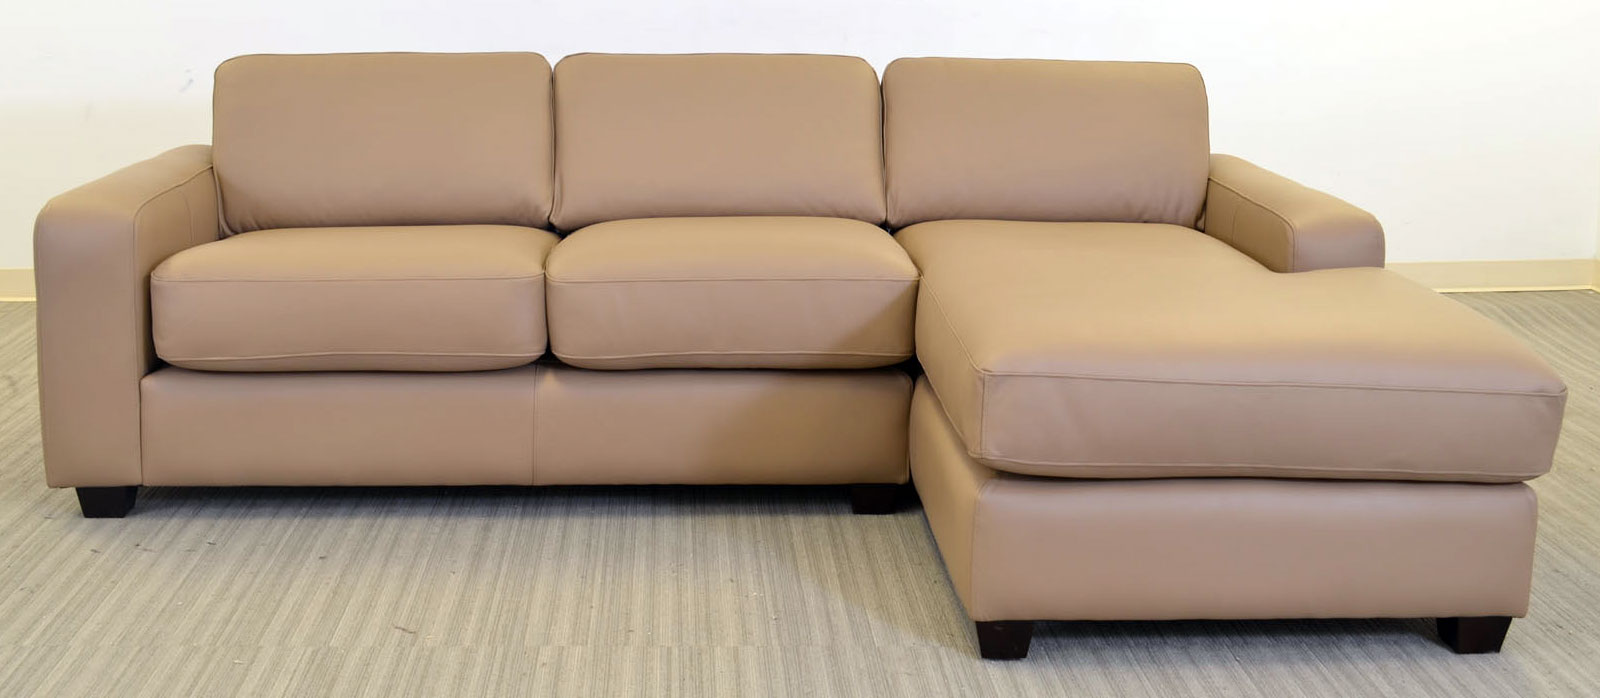 eden sofa the leather sofa company loveseat chaise lounge so